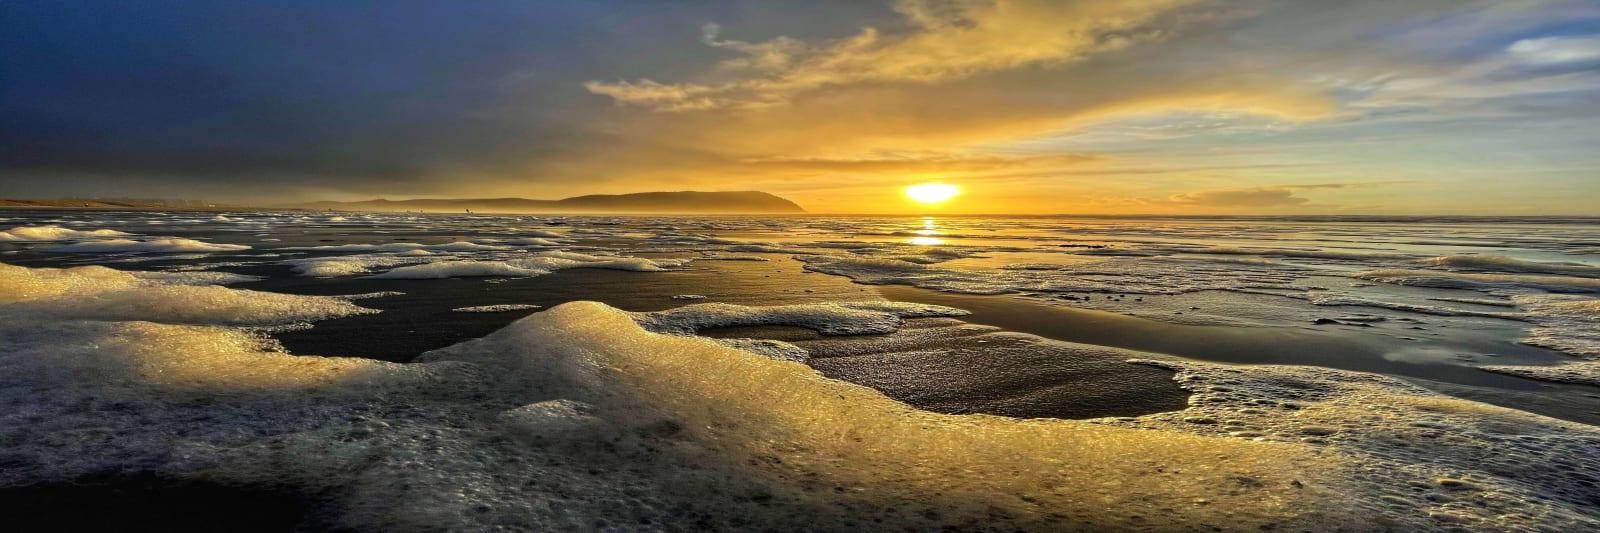 sunset-resized-w1600.jpg